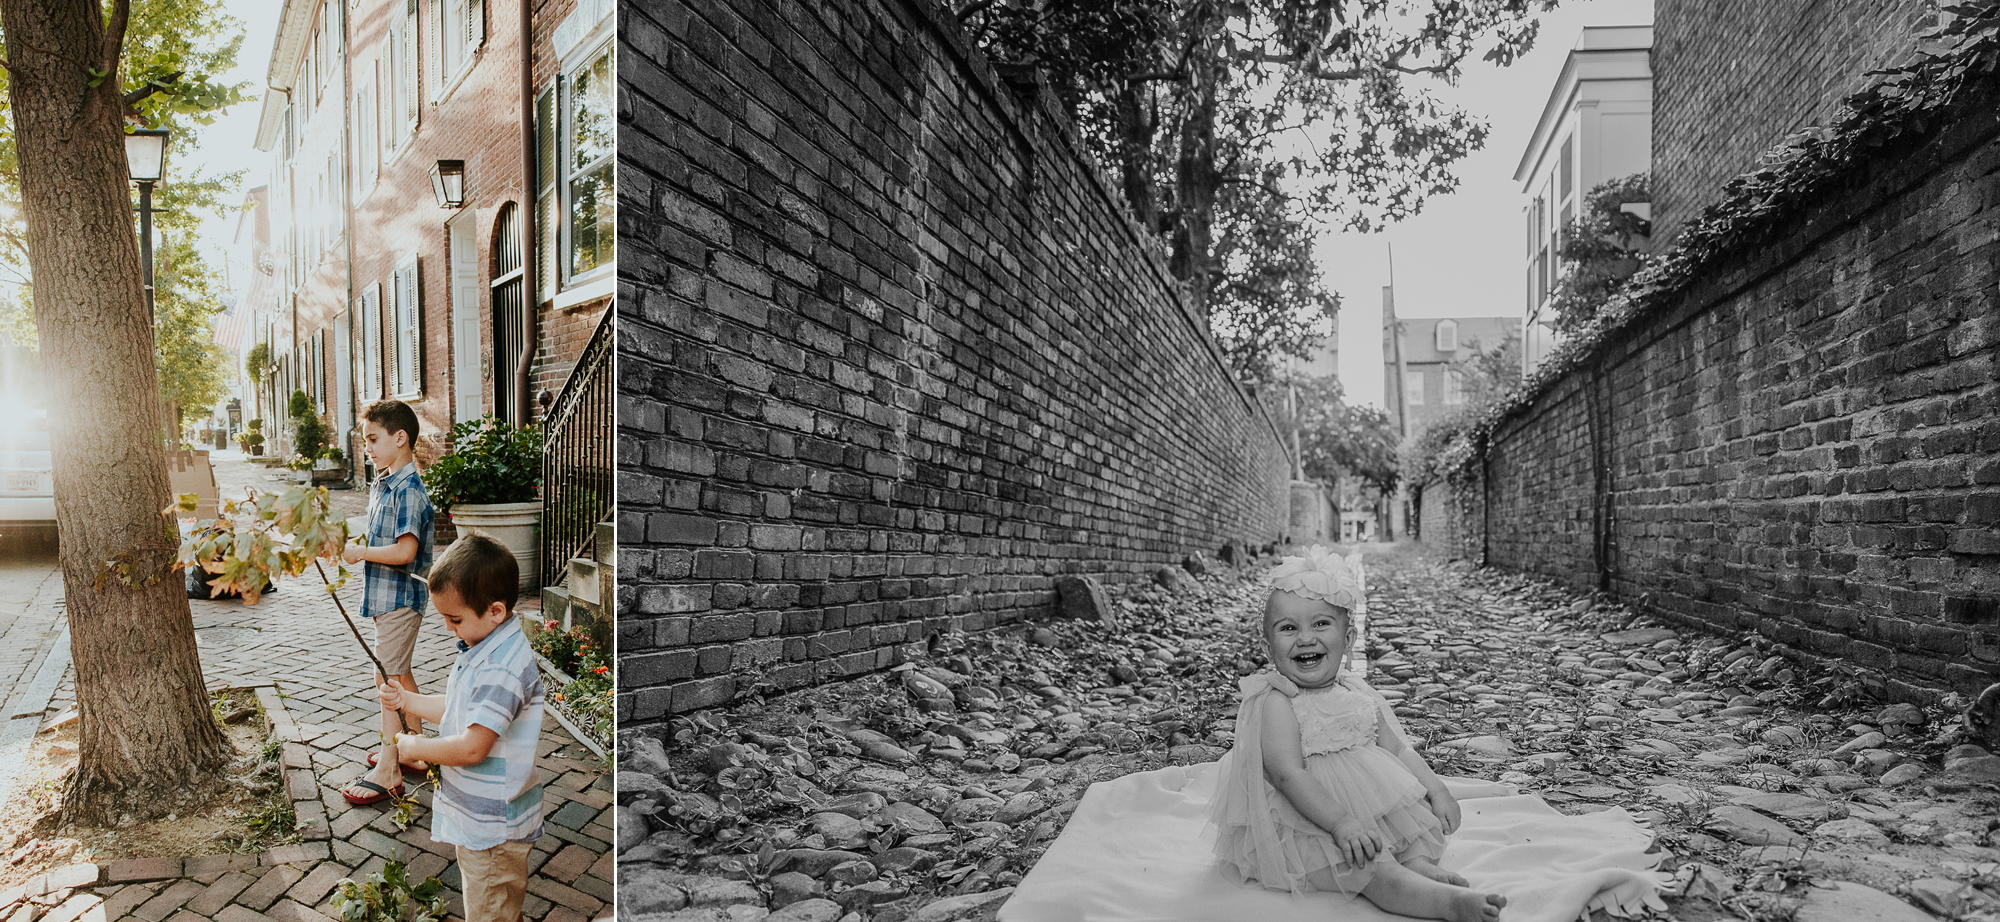 004-oldtown_alexandria_family_photography.jpg